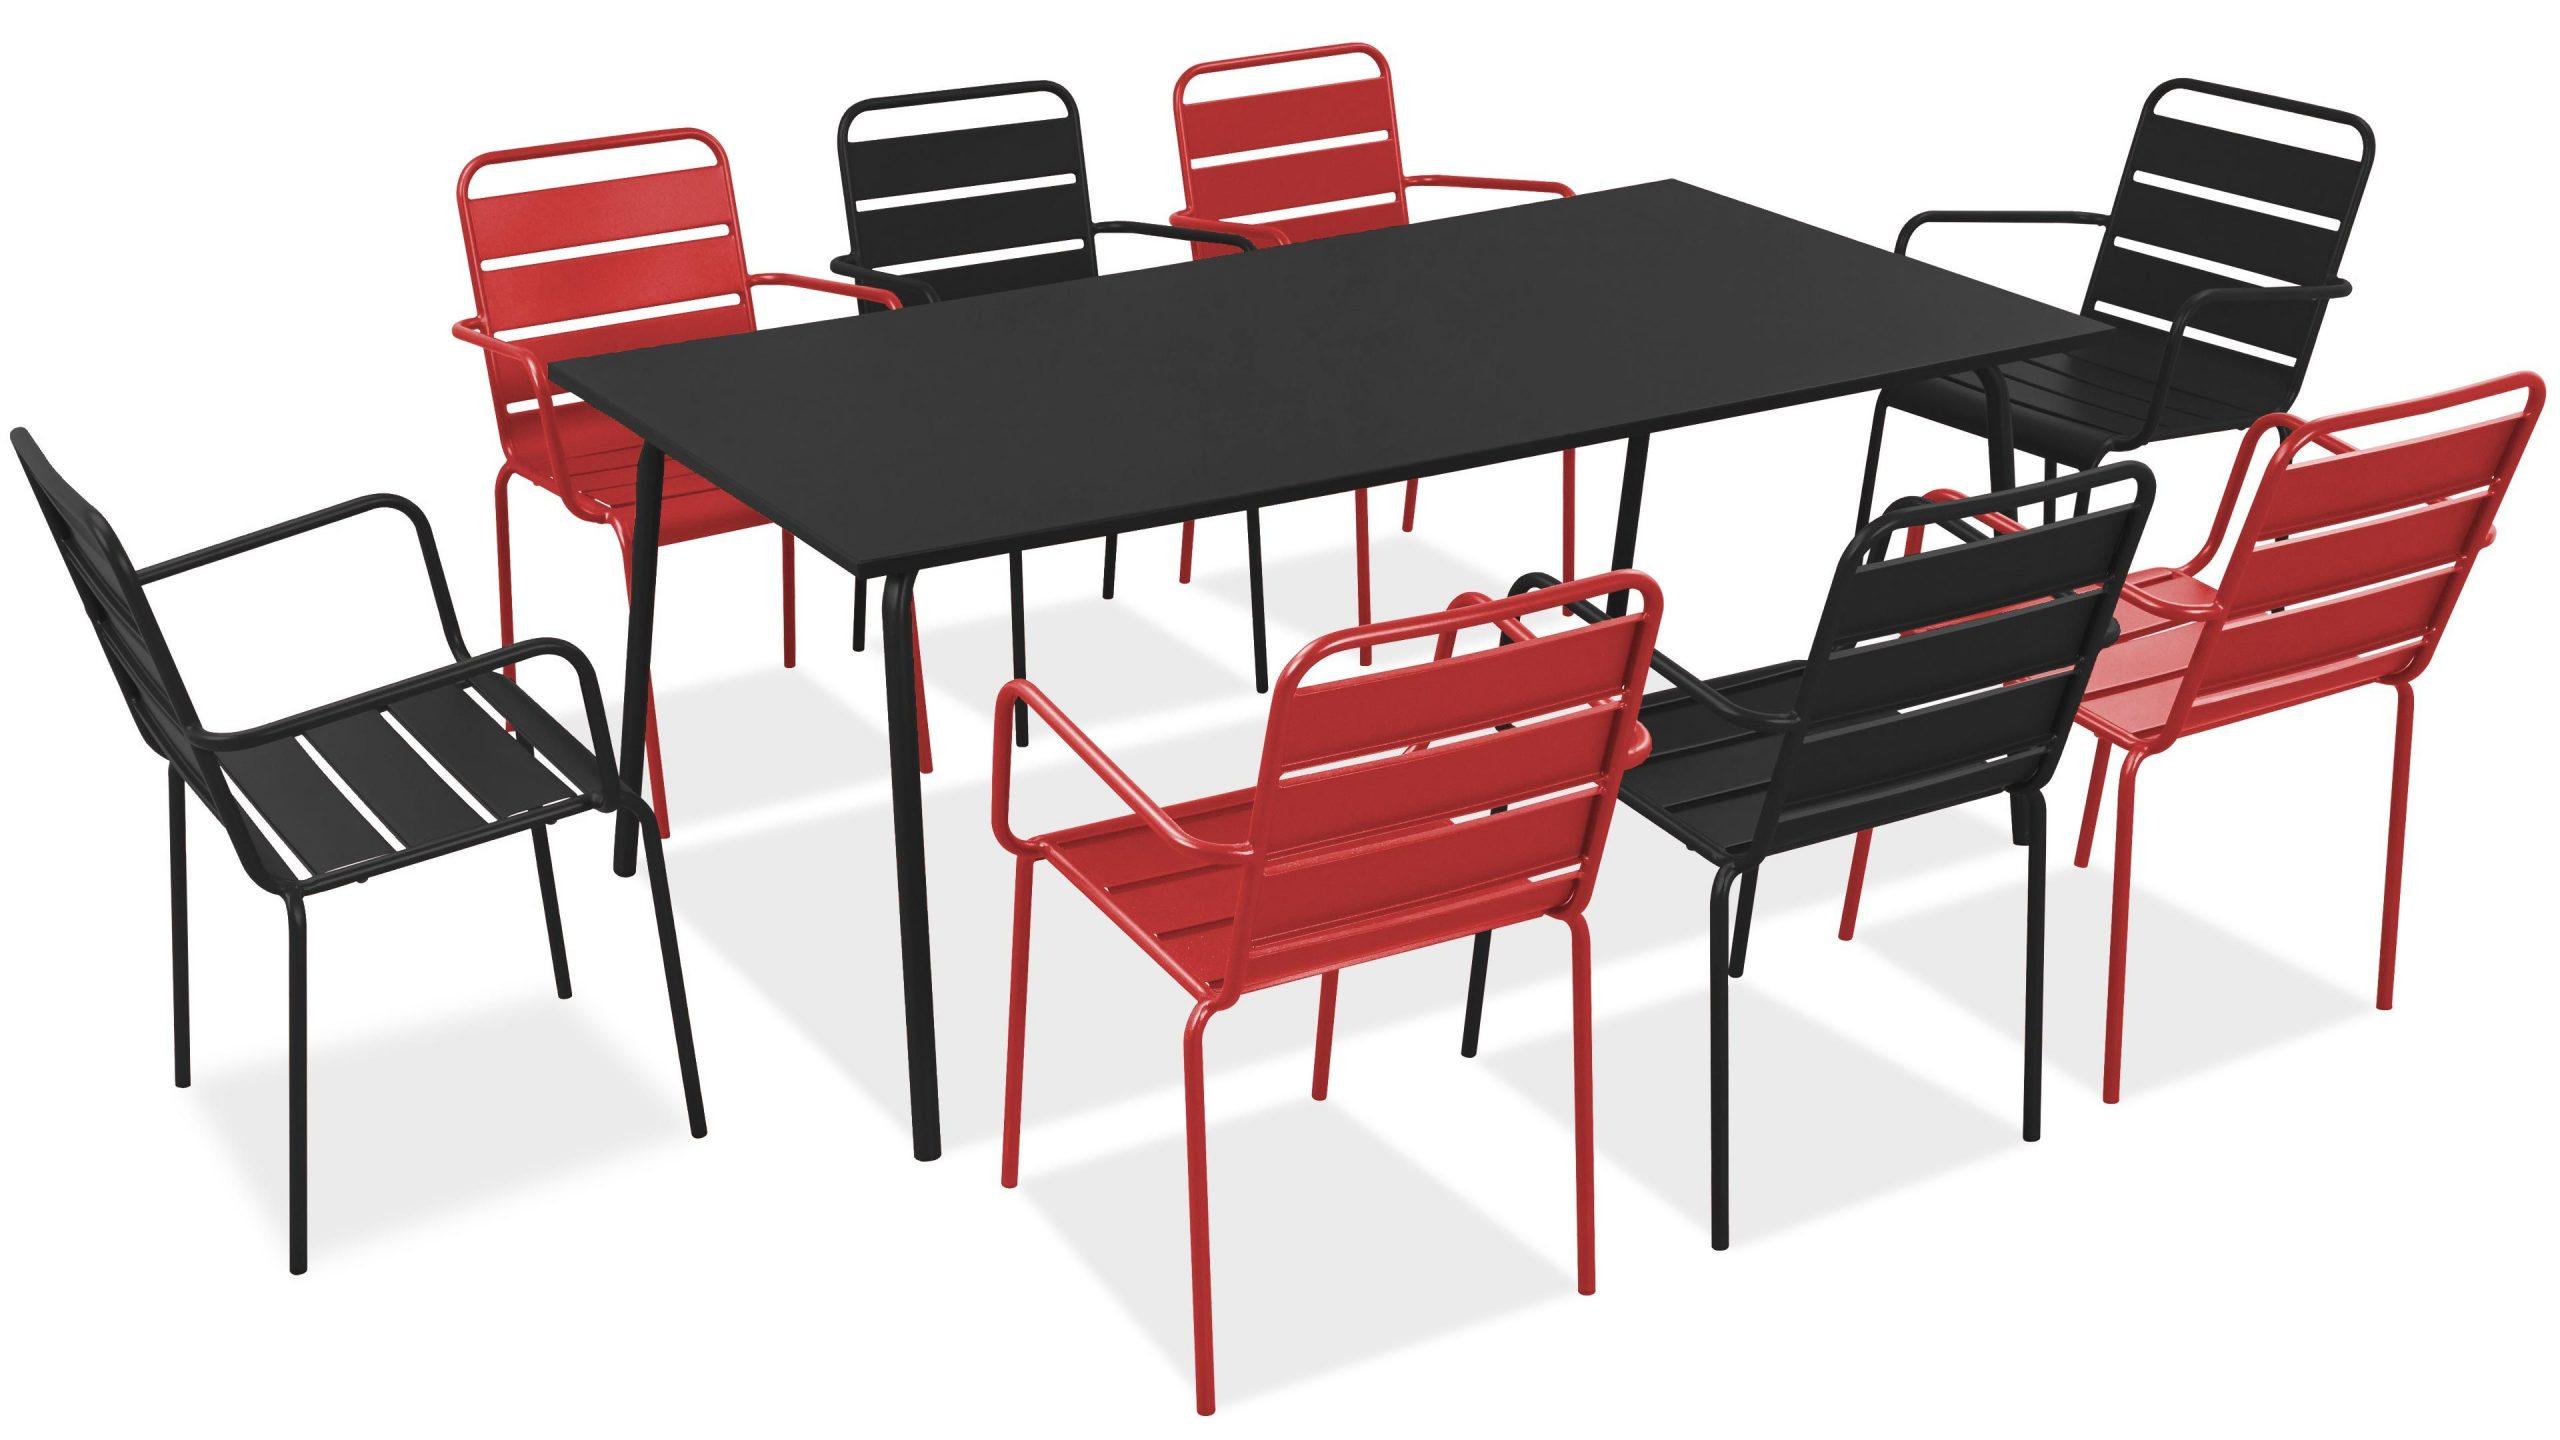 Salon De Jardin Metal Table Et Fauteuils destiné Salon De Jardin Métal Coloré